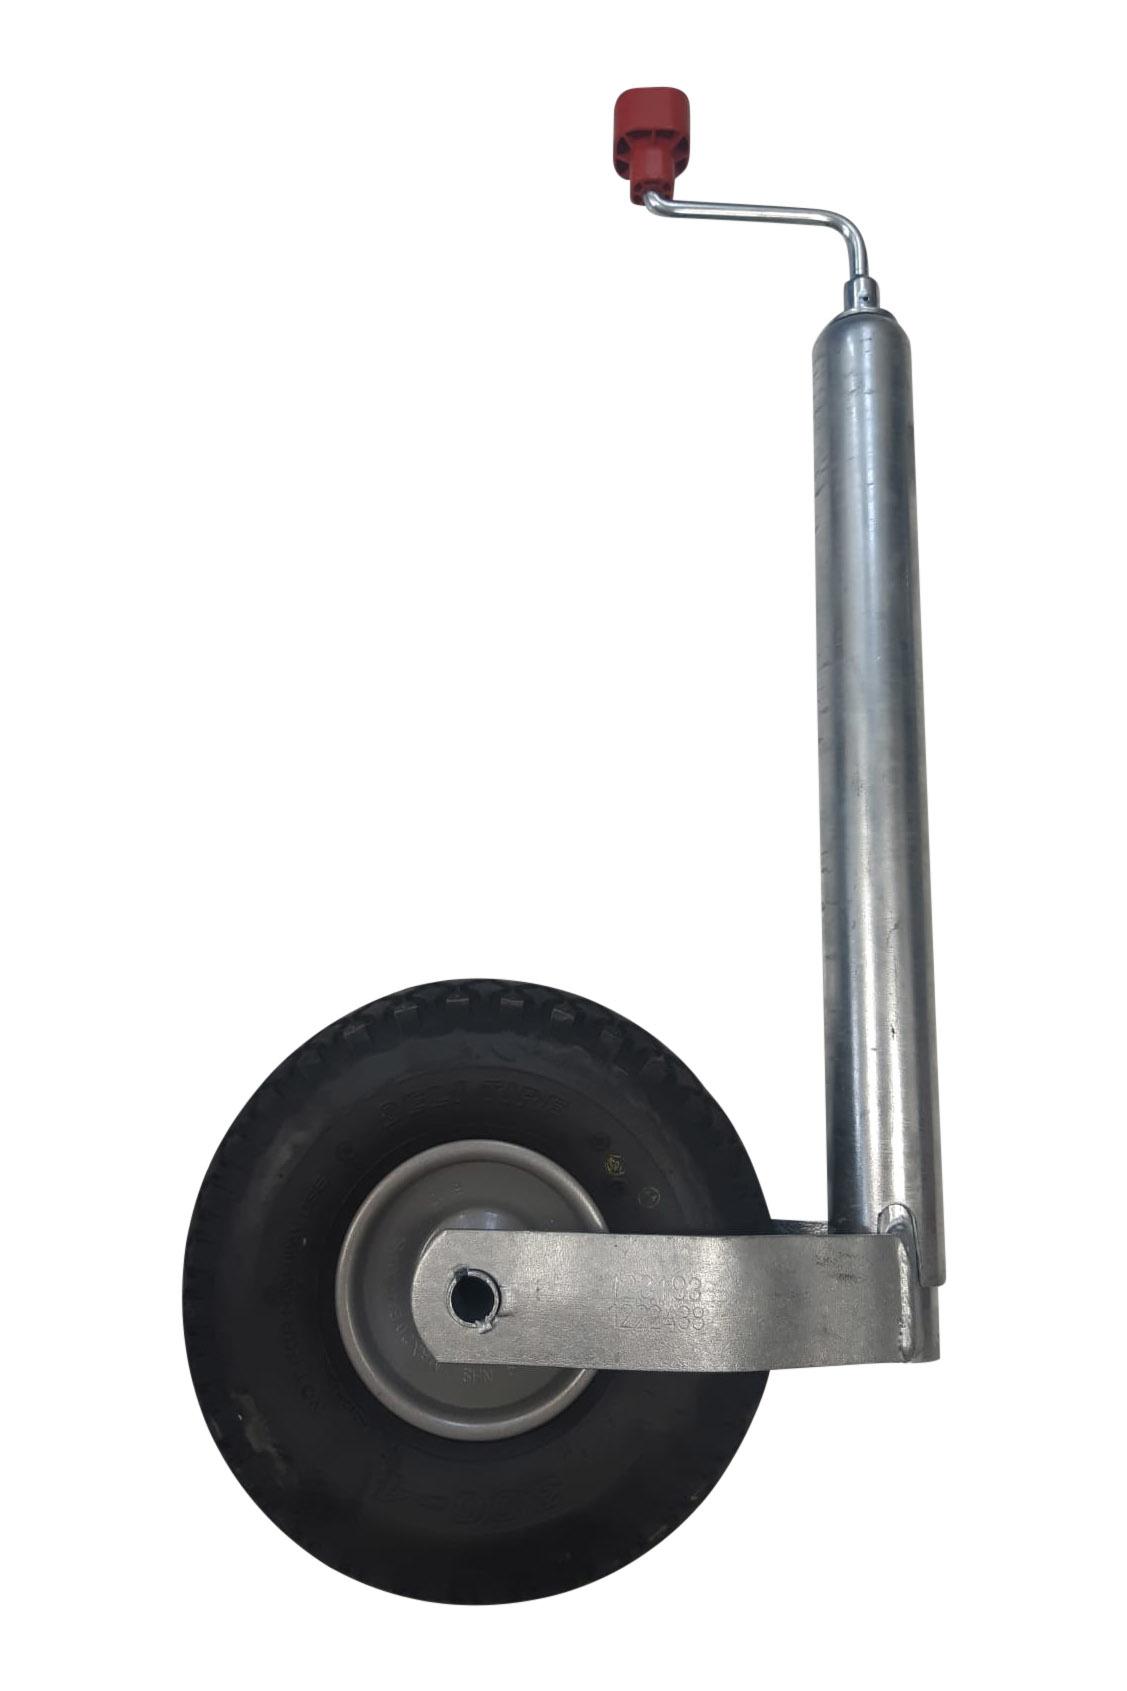 AL-KO Neuswiel Plus Alko , rond diameter 48 mm, extra lang, stalen velg met luchtband ( 260 x 85)